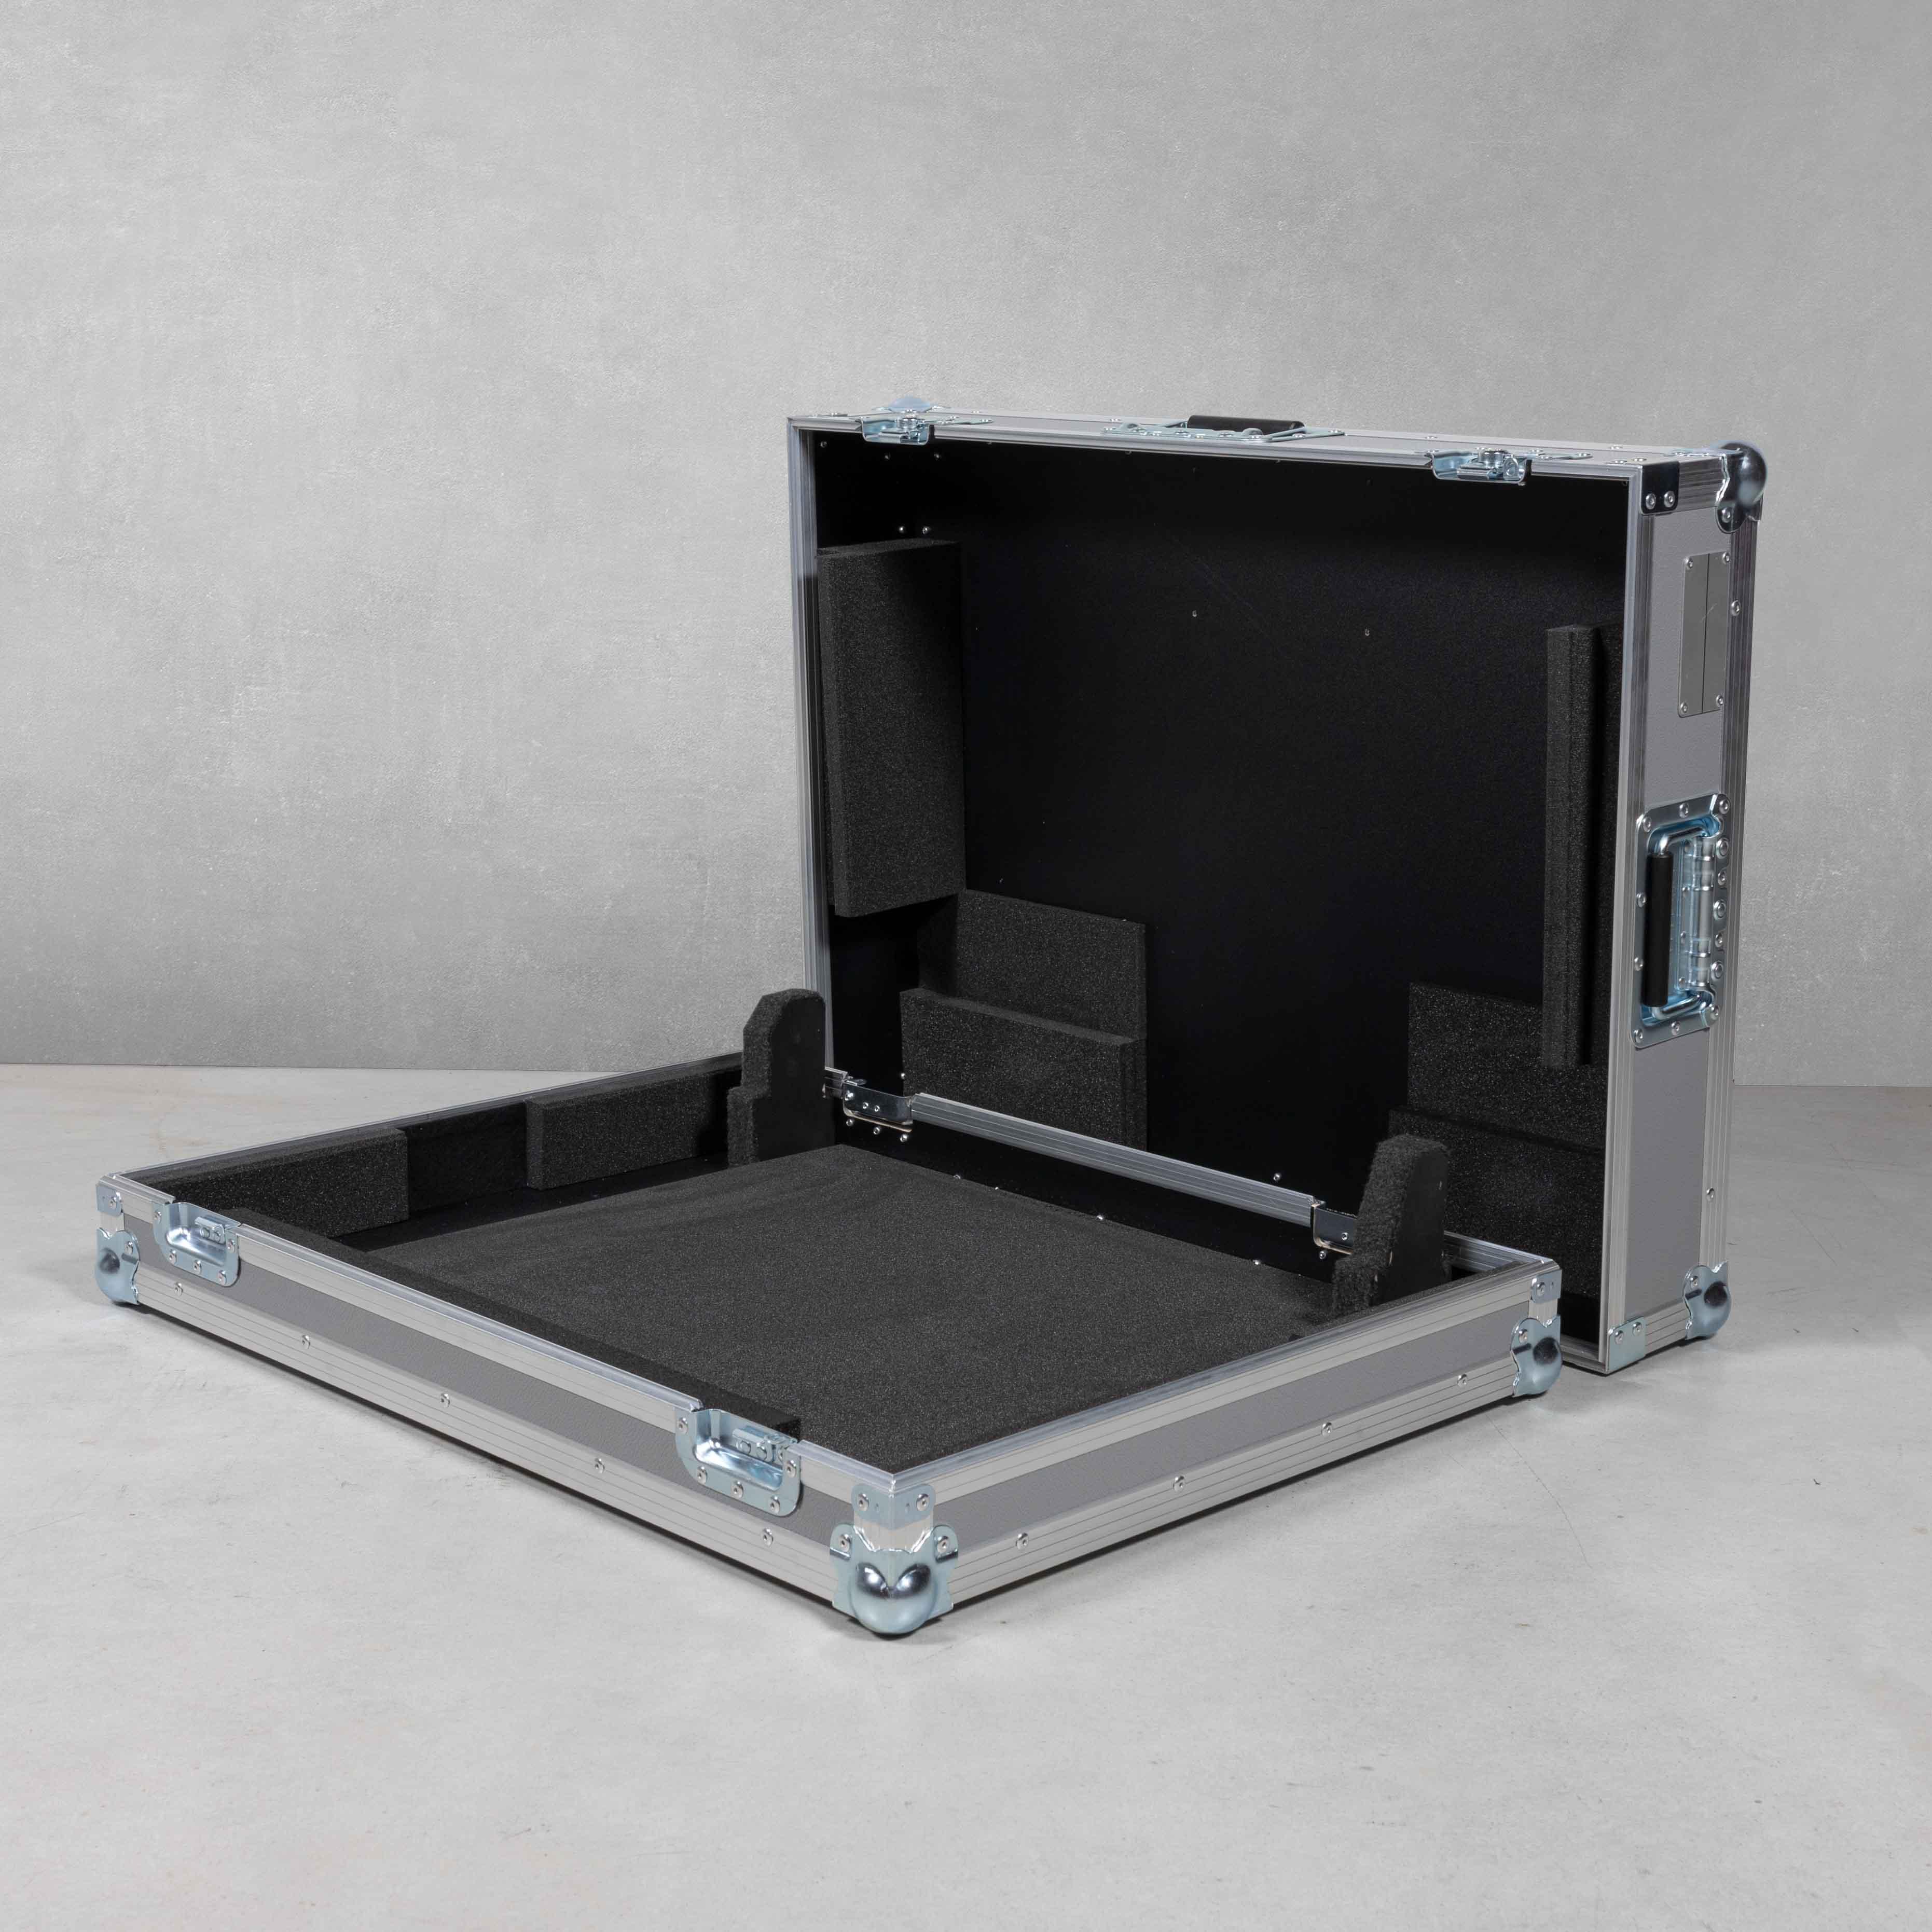 Case für Blackmagic Design ATEM 2 M/E Advanced Panel